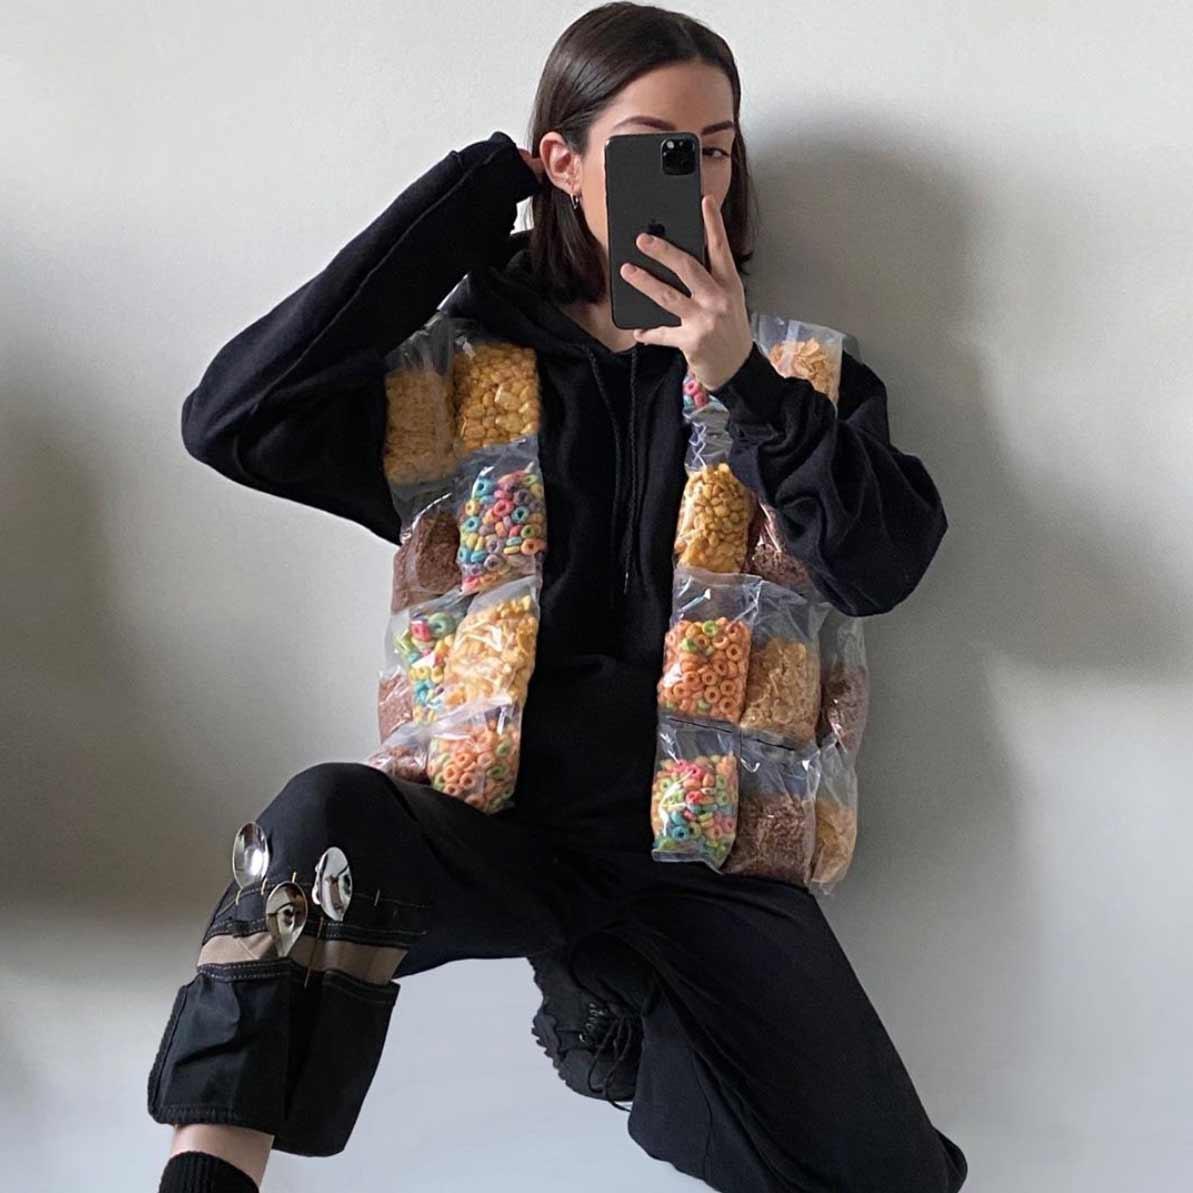 Gummibären-Hose, Sushi-Schlappen oder Waffel-Weste Nicole-McLaughlin-food-fashion_10